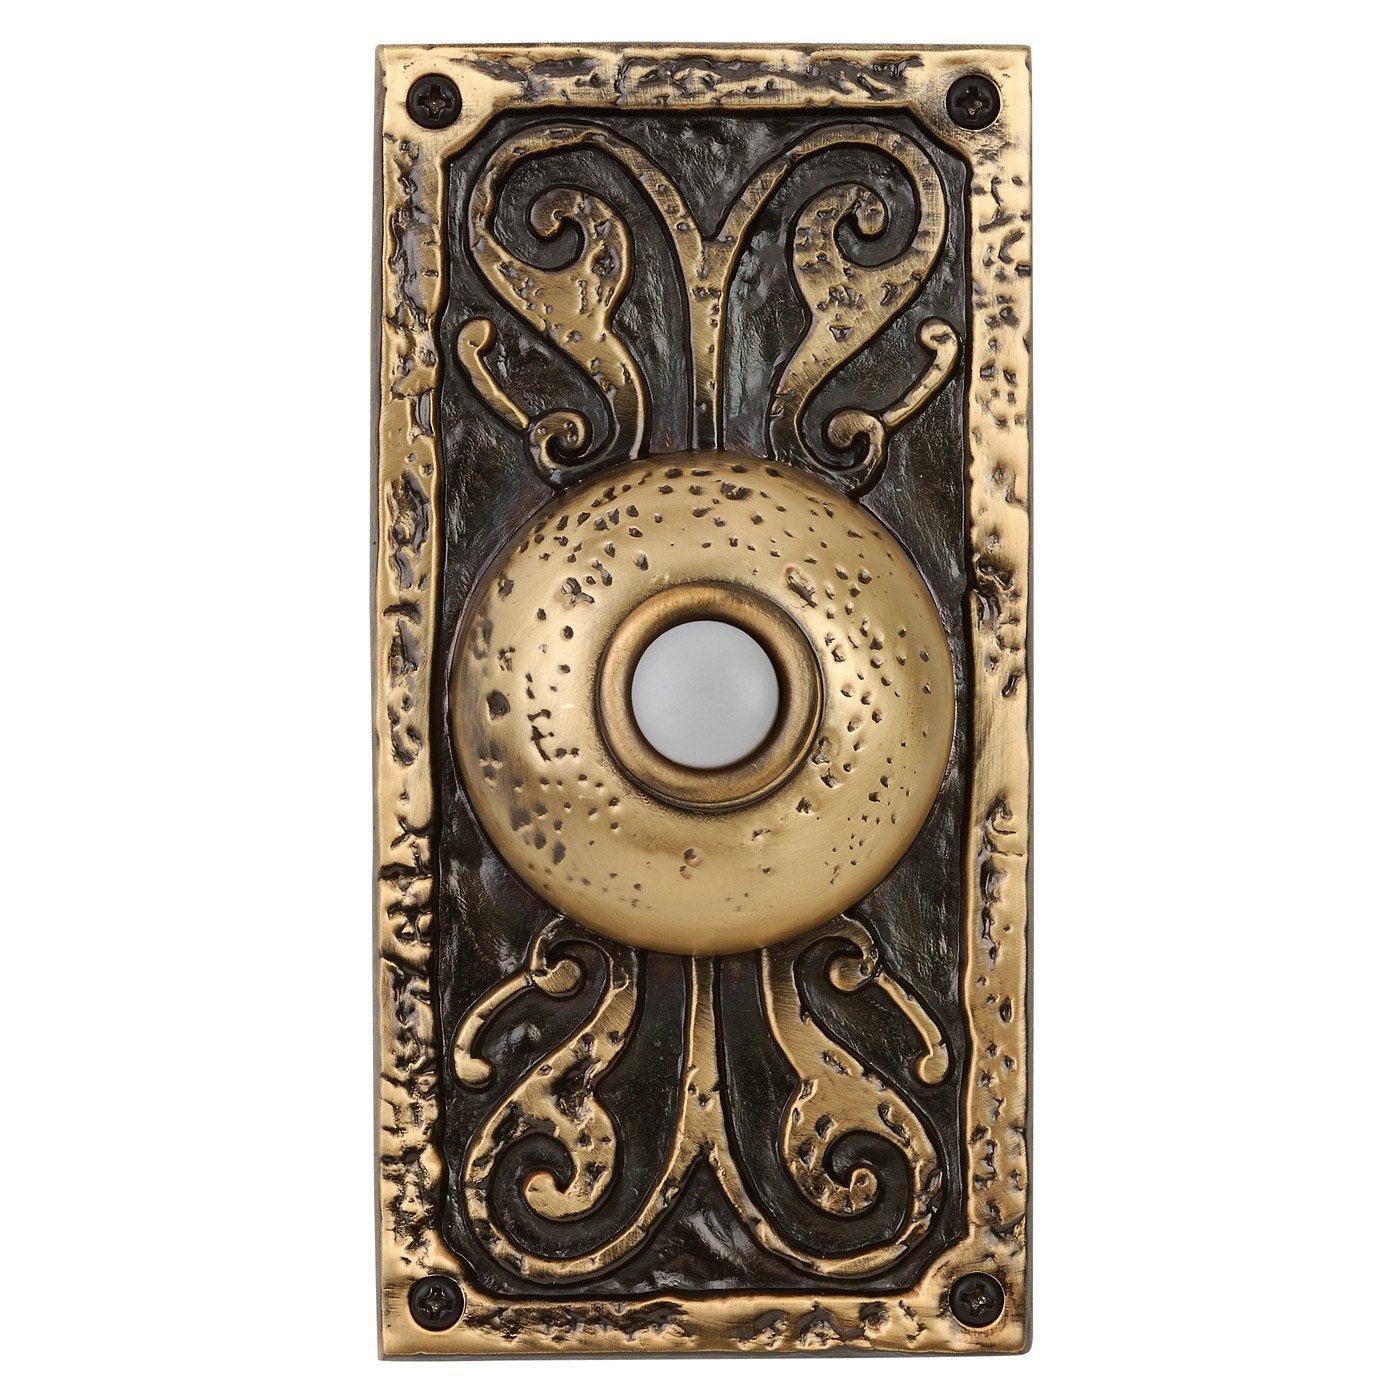 Decorative Wireless Doorbells Displaying Sophistication That